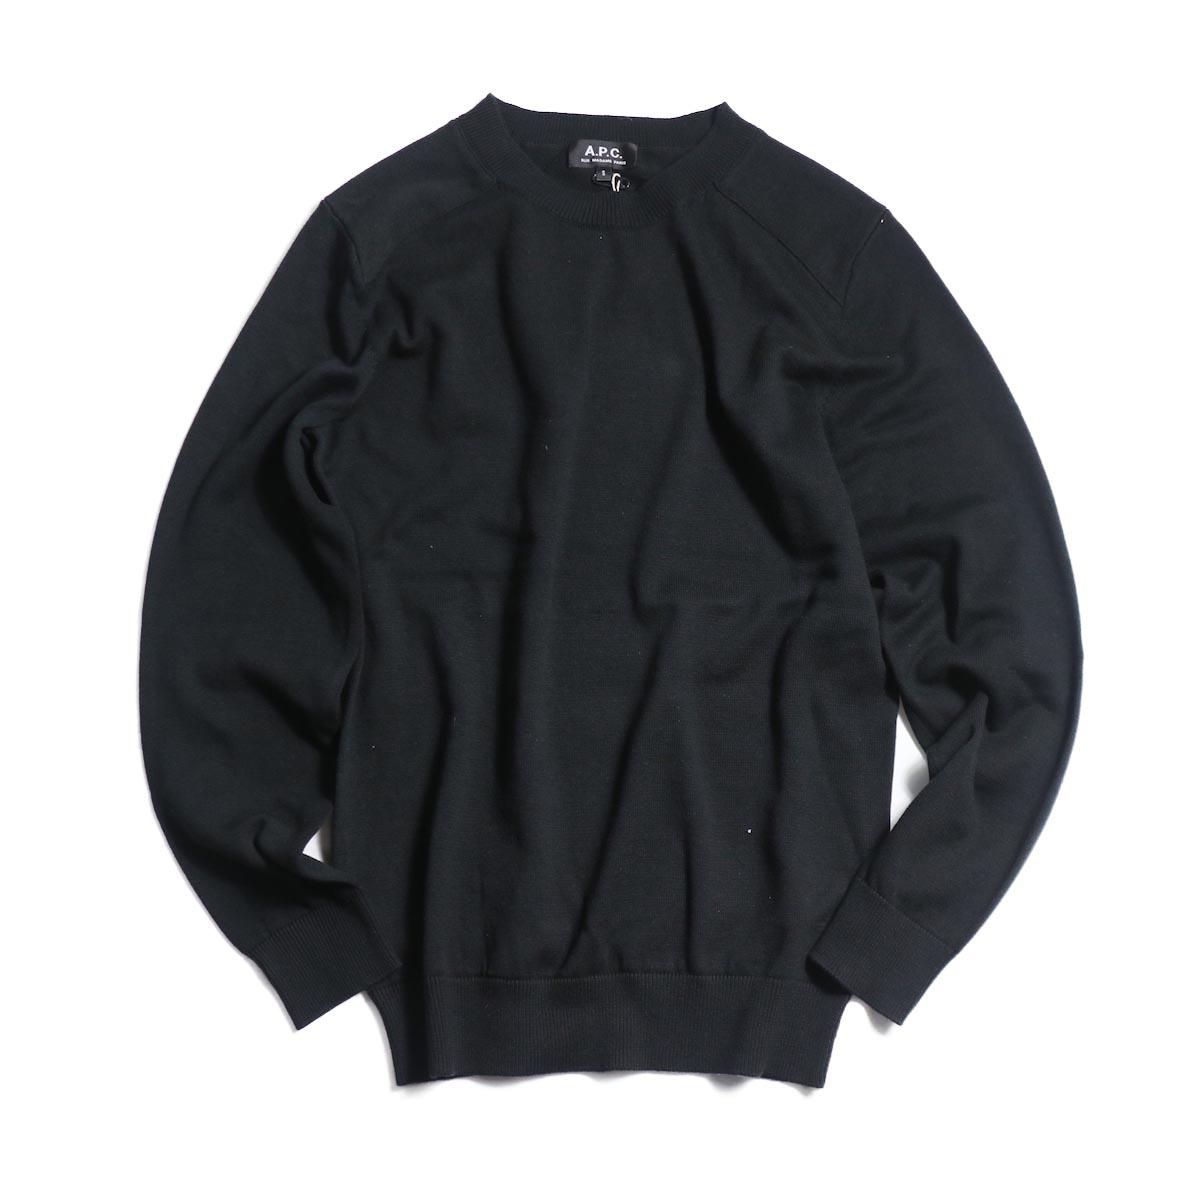 A.P.C. / Johnny Sweater -BLACK